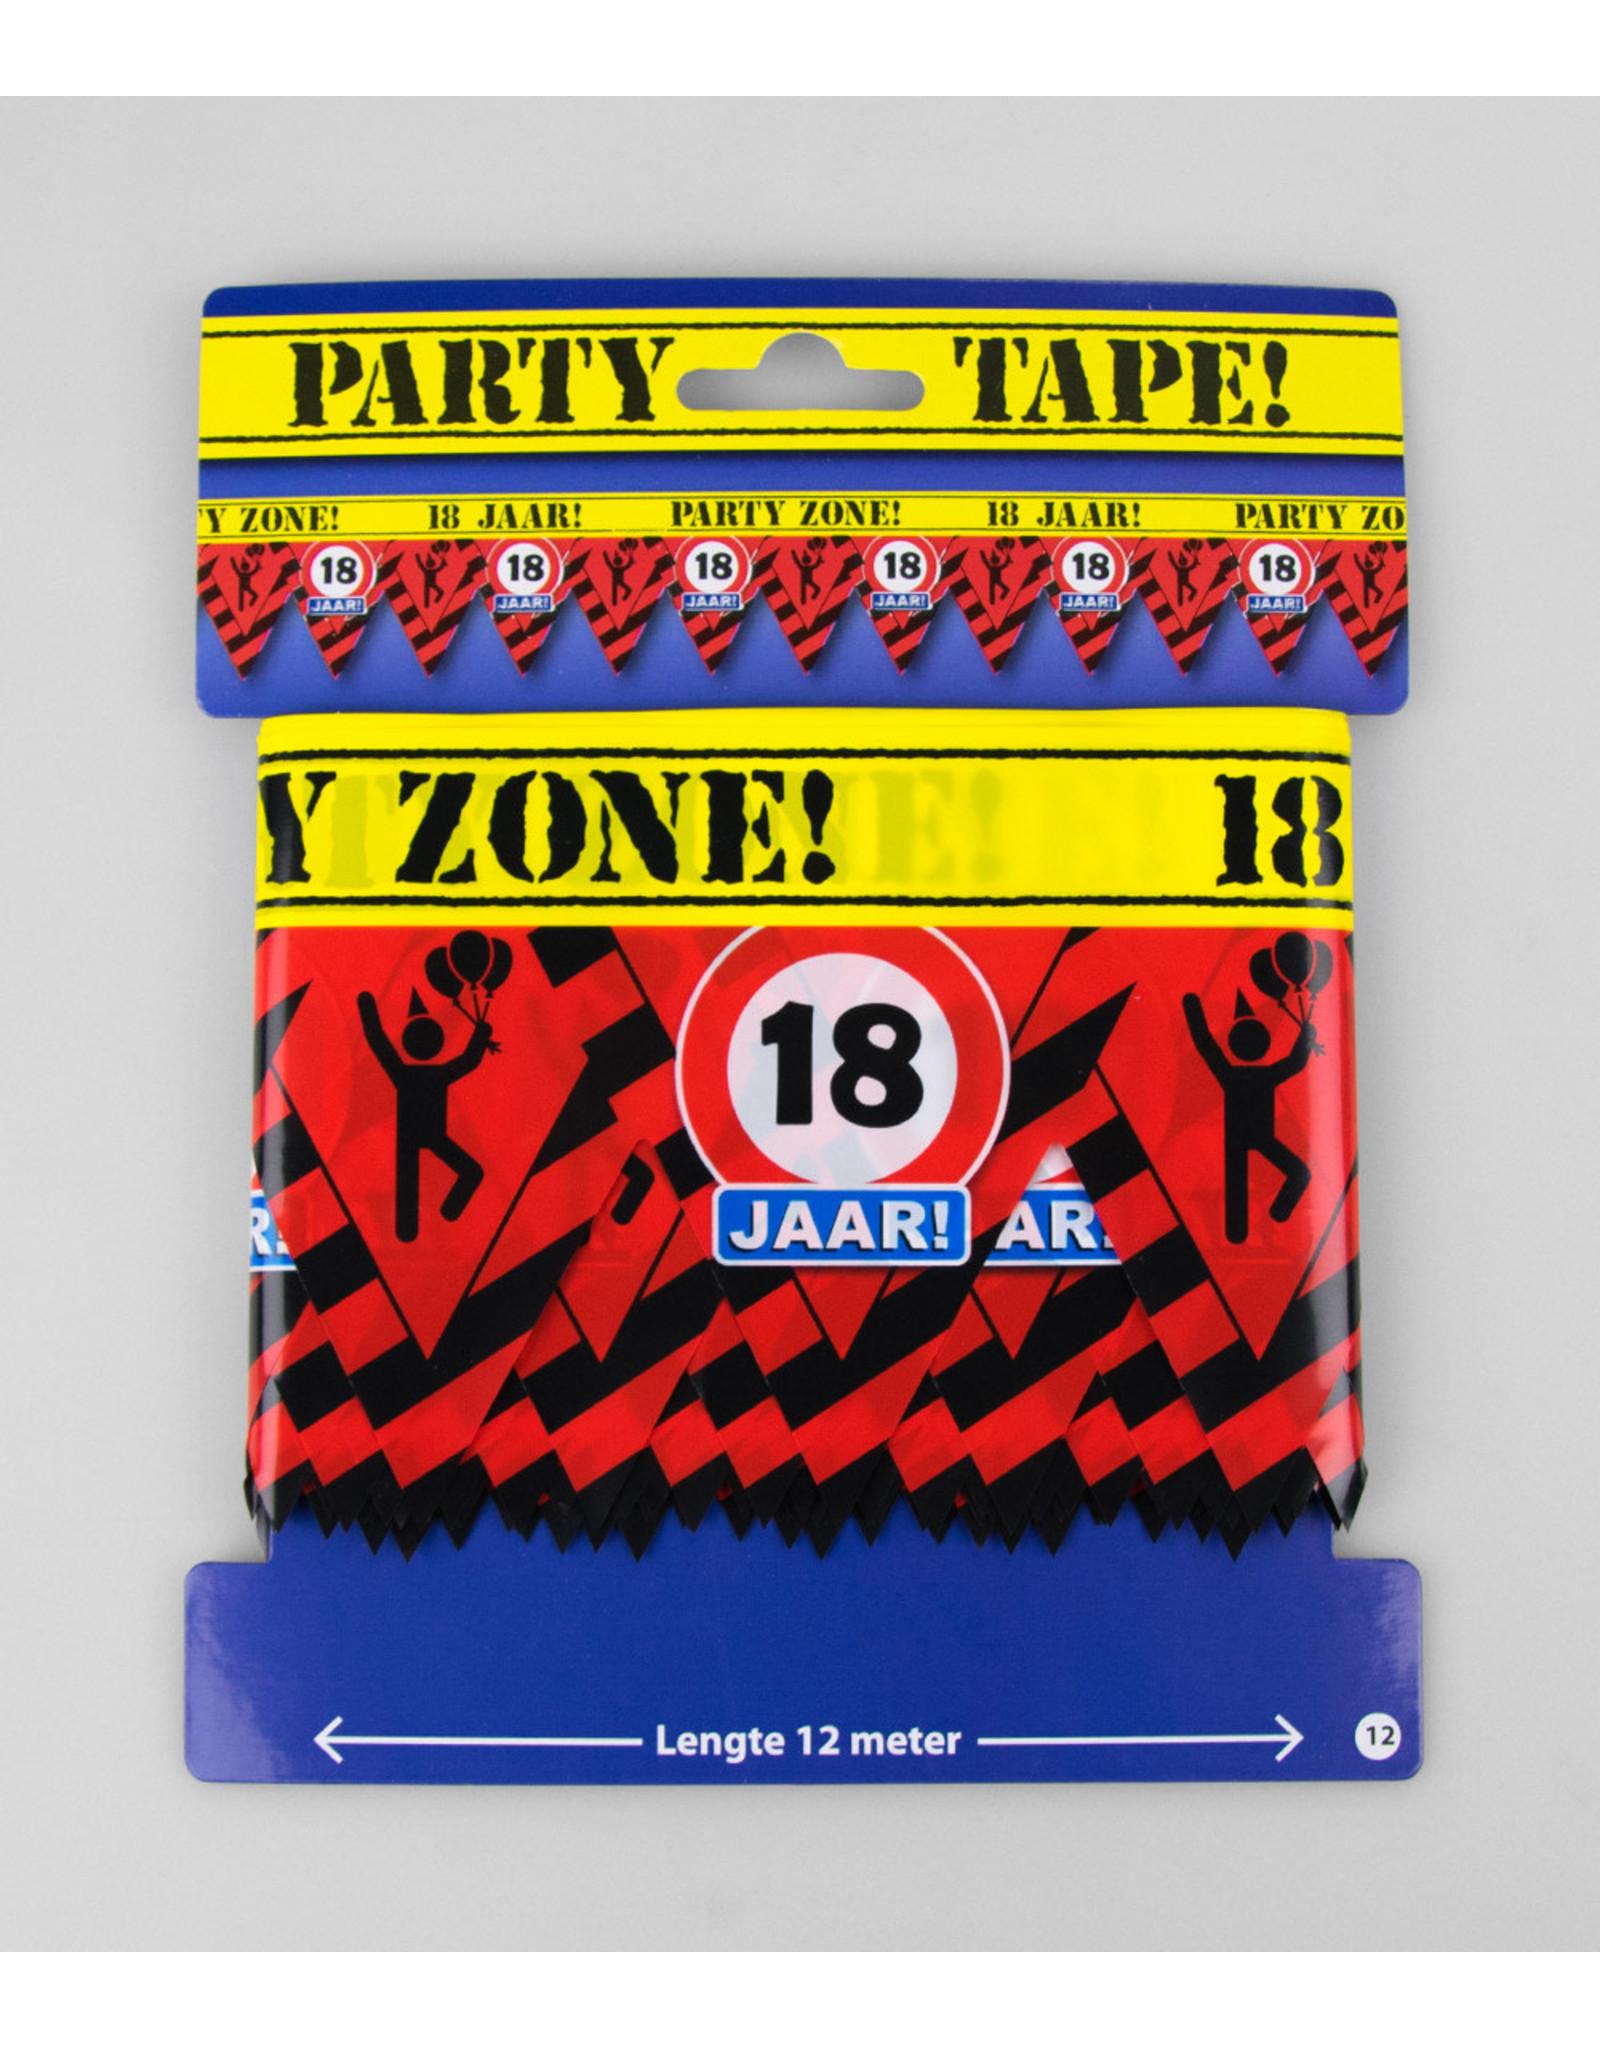 Afzetlint party zone 18 jaar